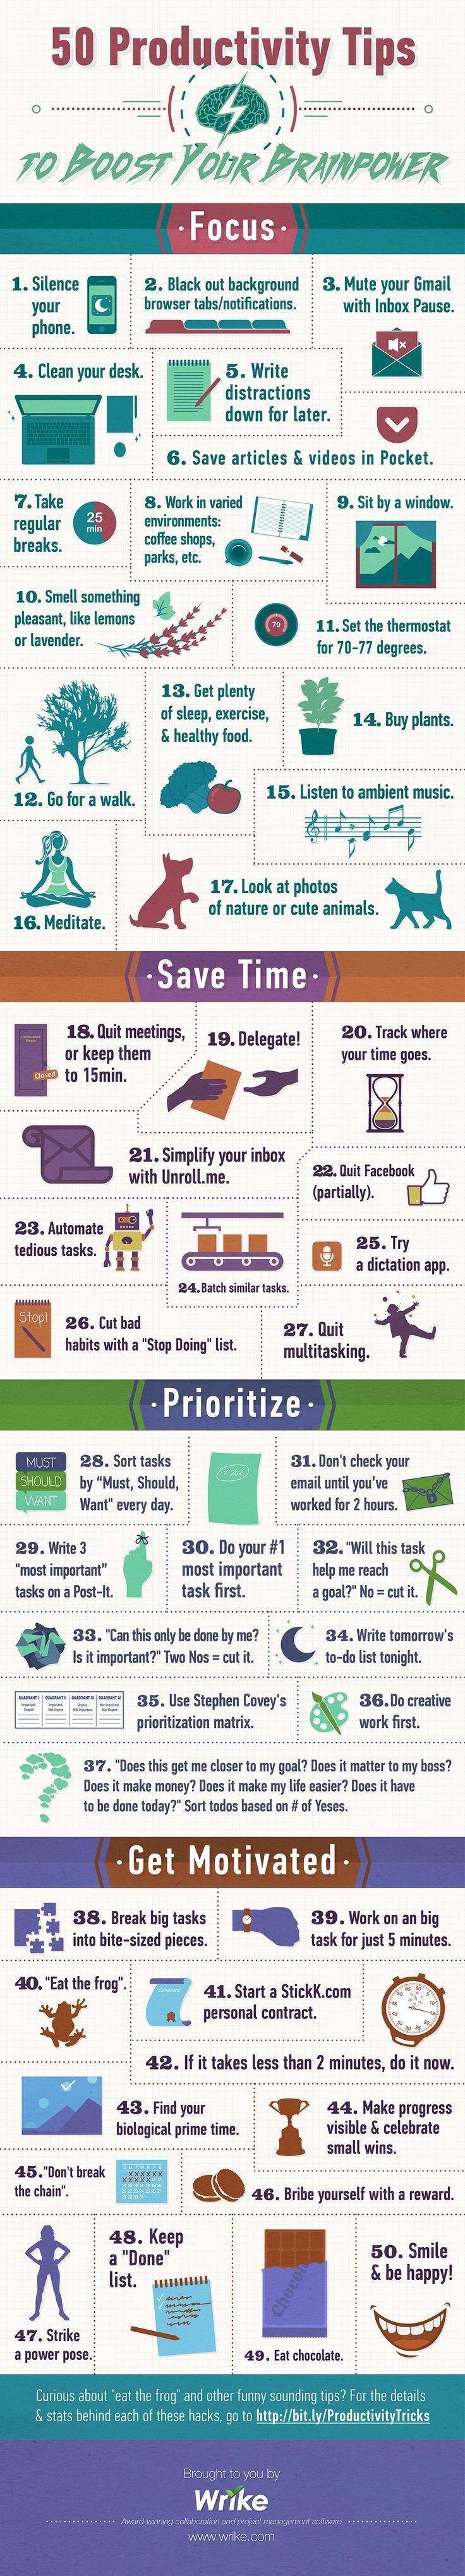 50 keer meer productiviteit